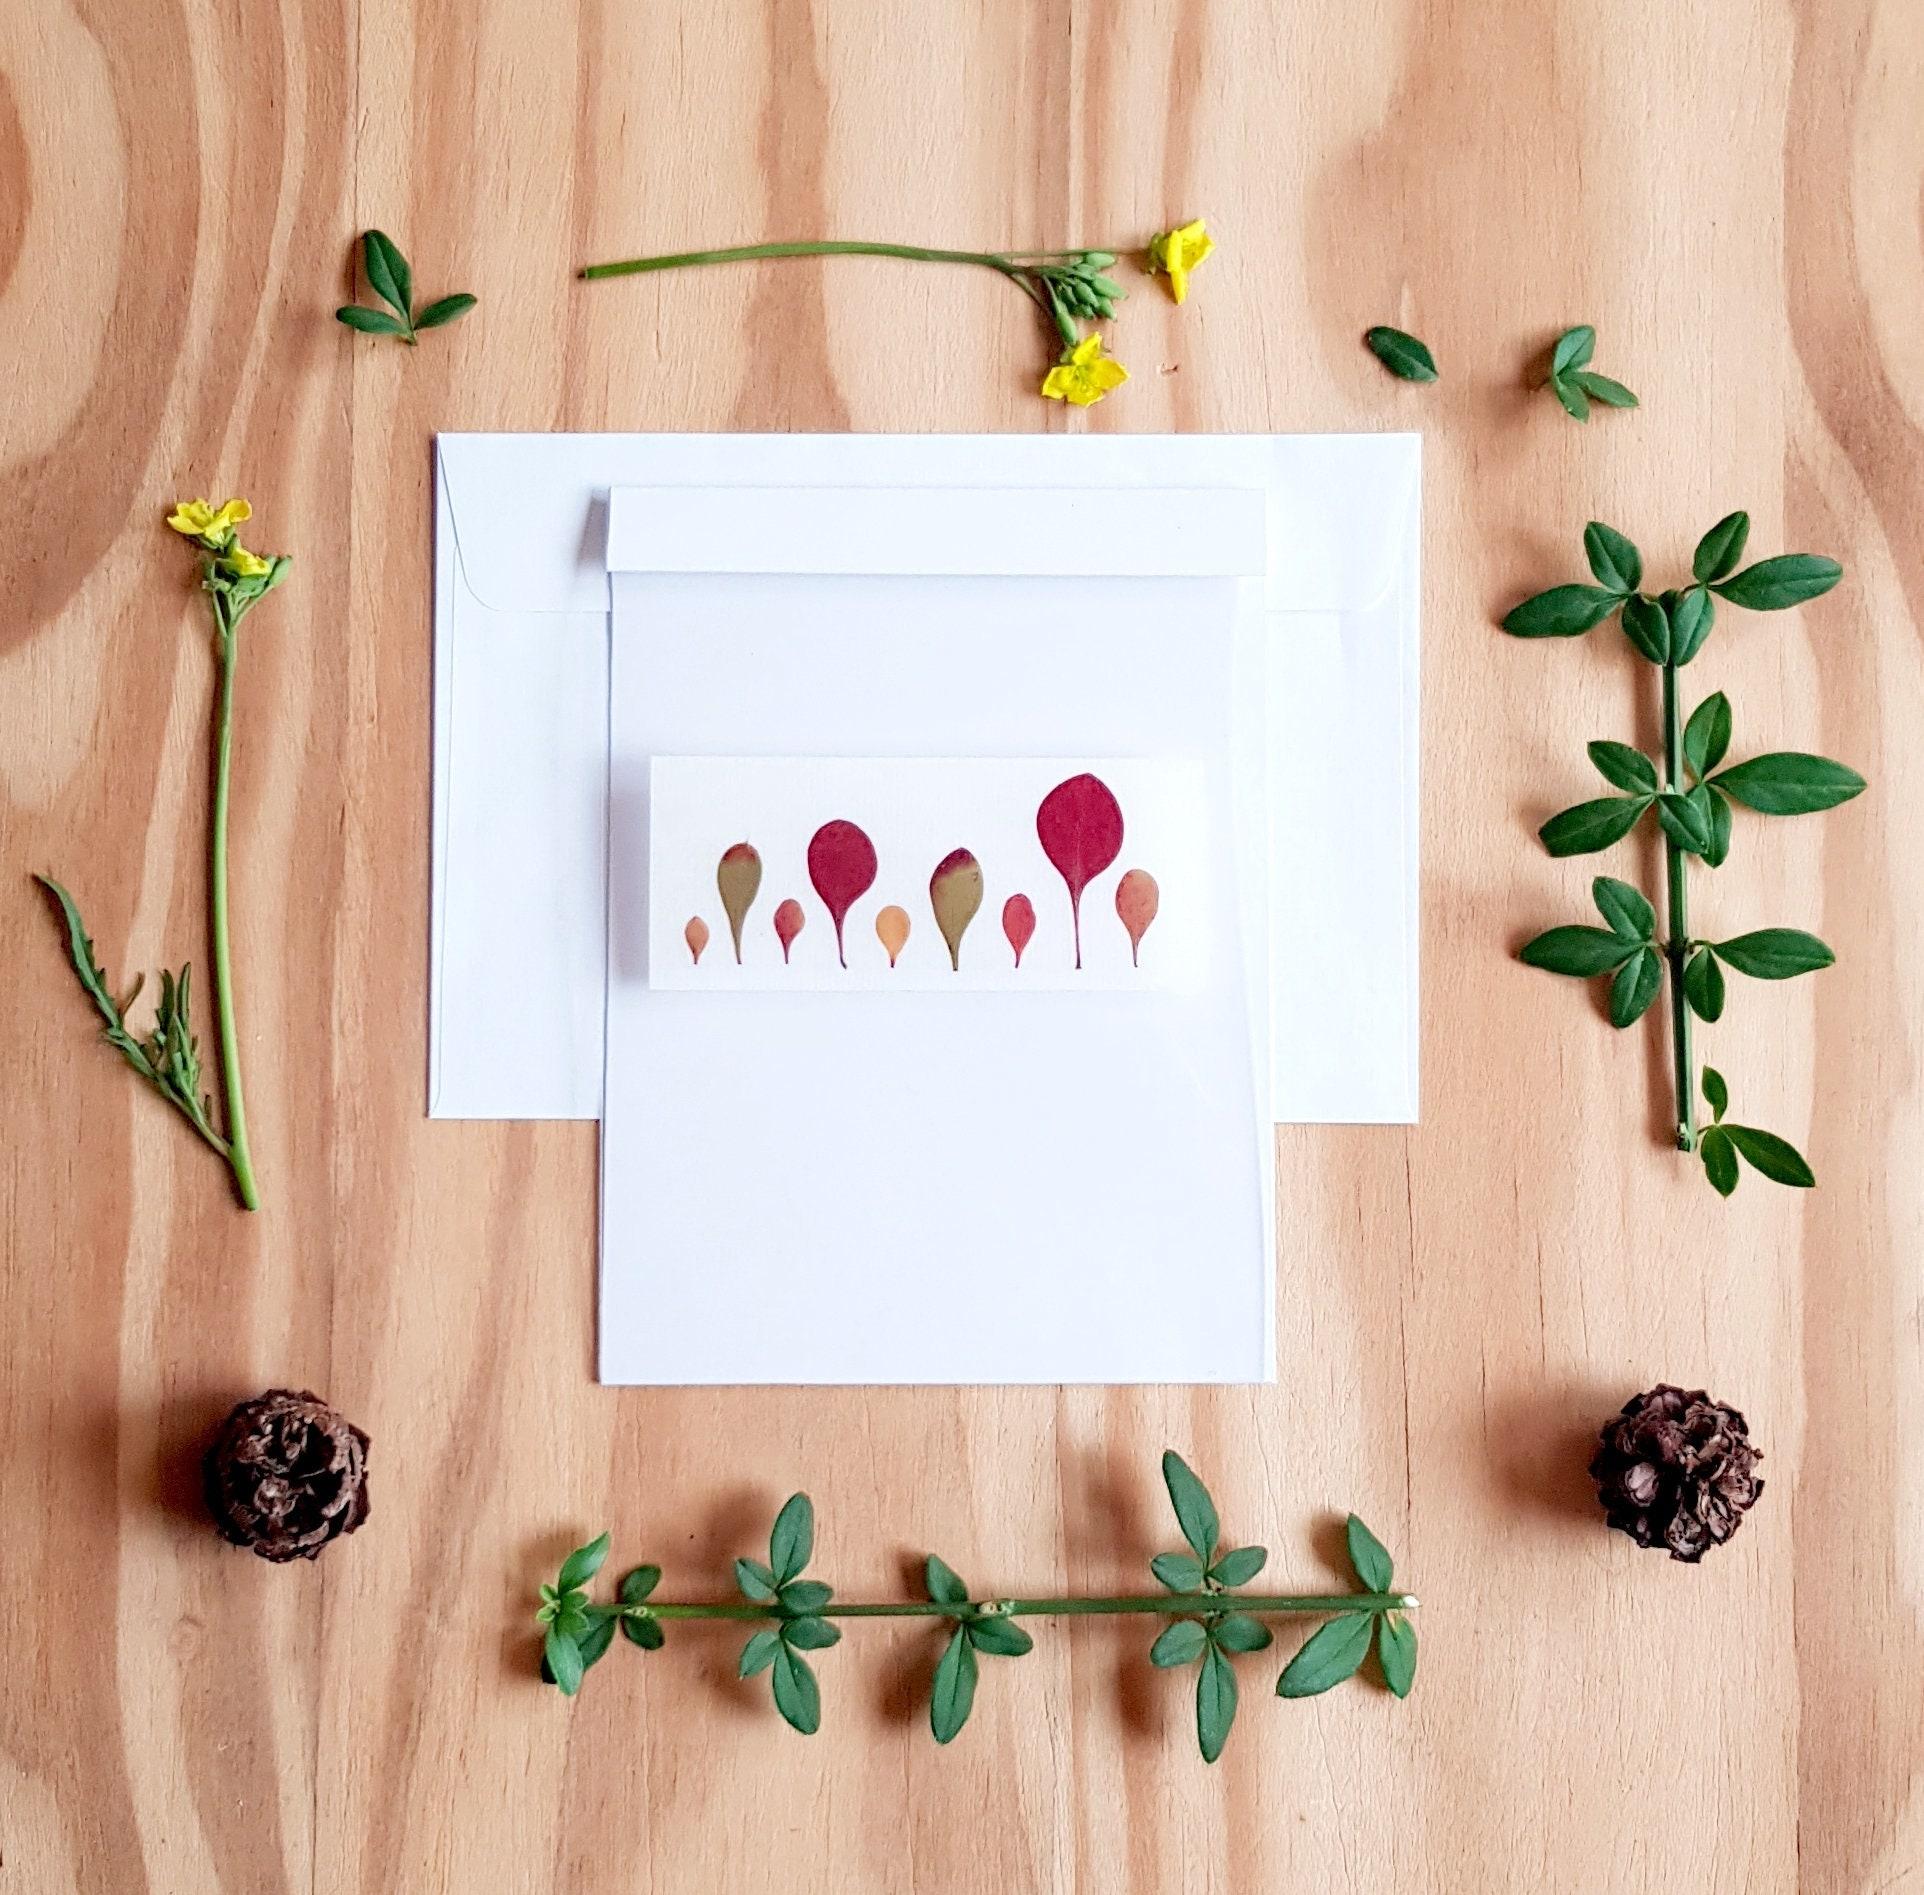 Autumn Leaves Pressed Flower Art Pressed Flower Cards Blank Cards